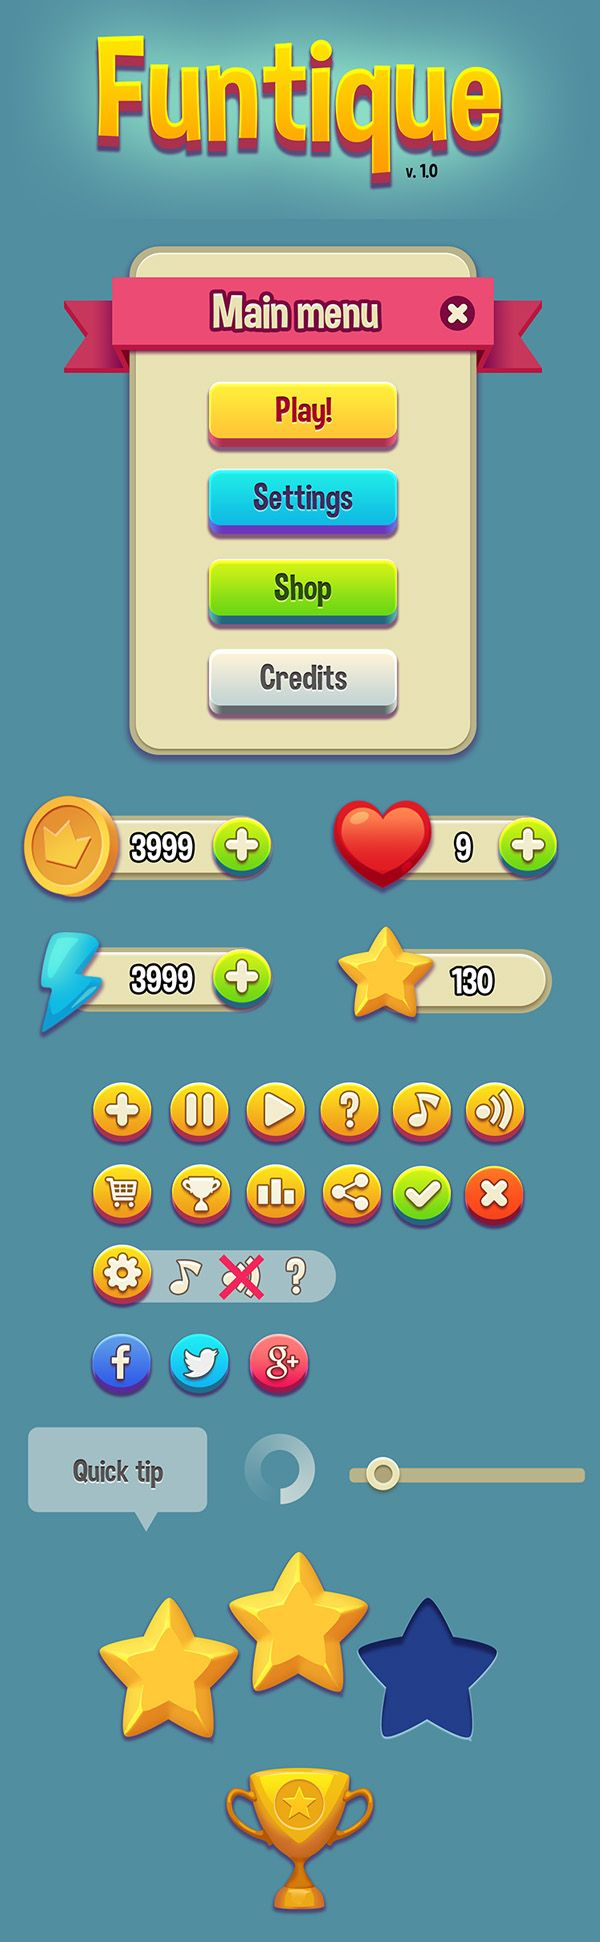 Free Game UI Kit (PSD) #freepsdfiles #freepsdgraphics #freepsdmockups #freebies